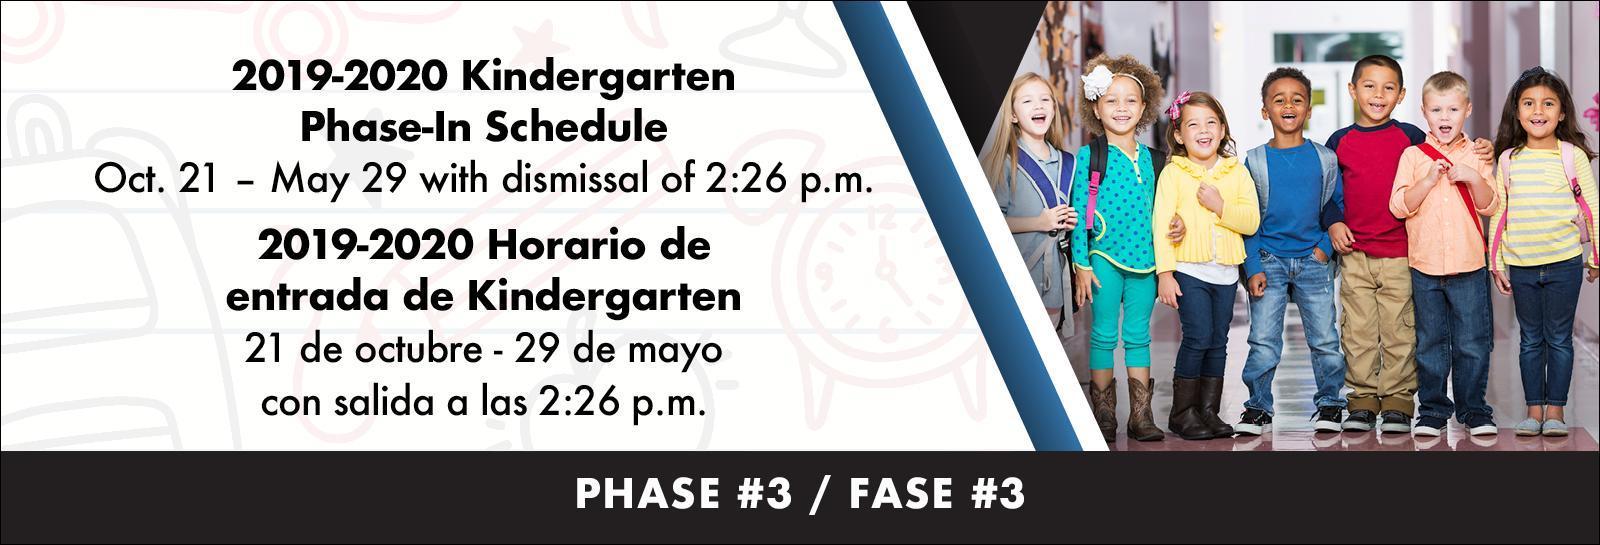 Kinder Phase in Schedule